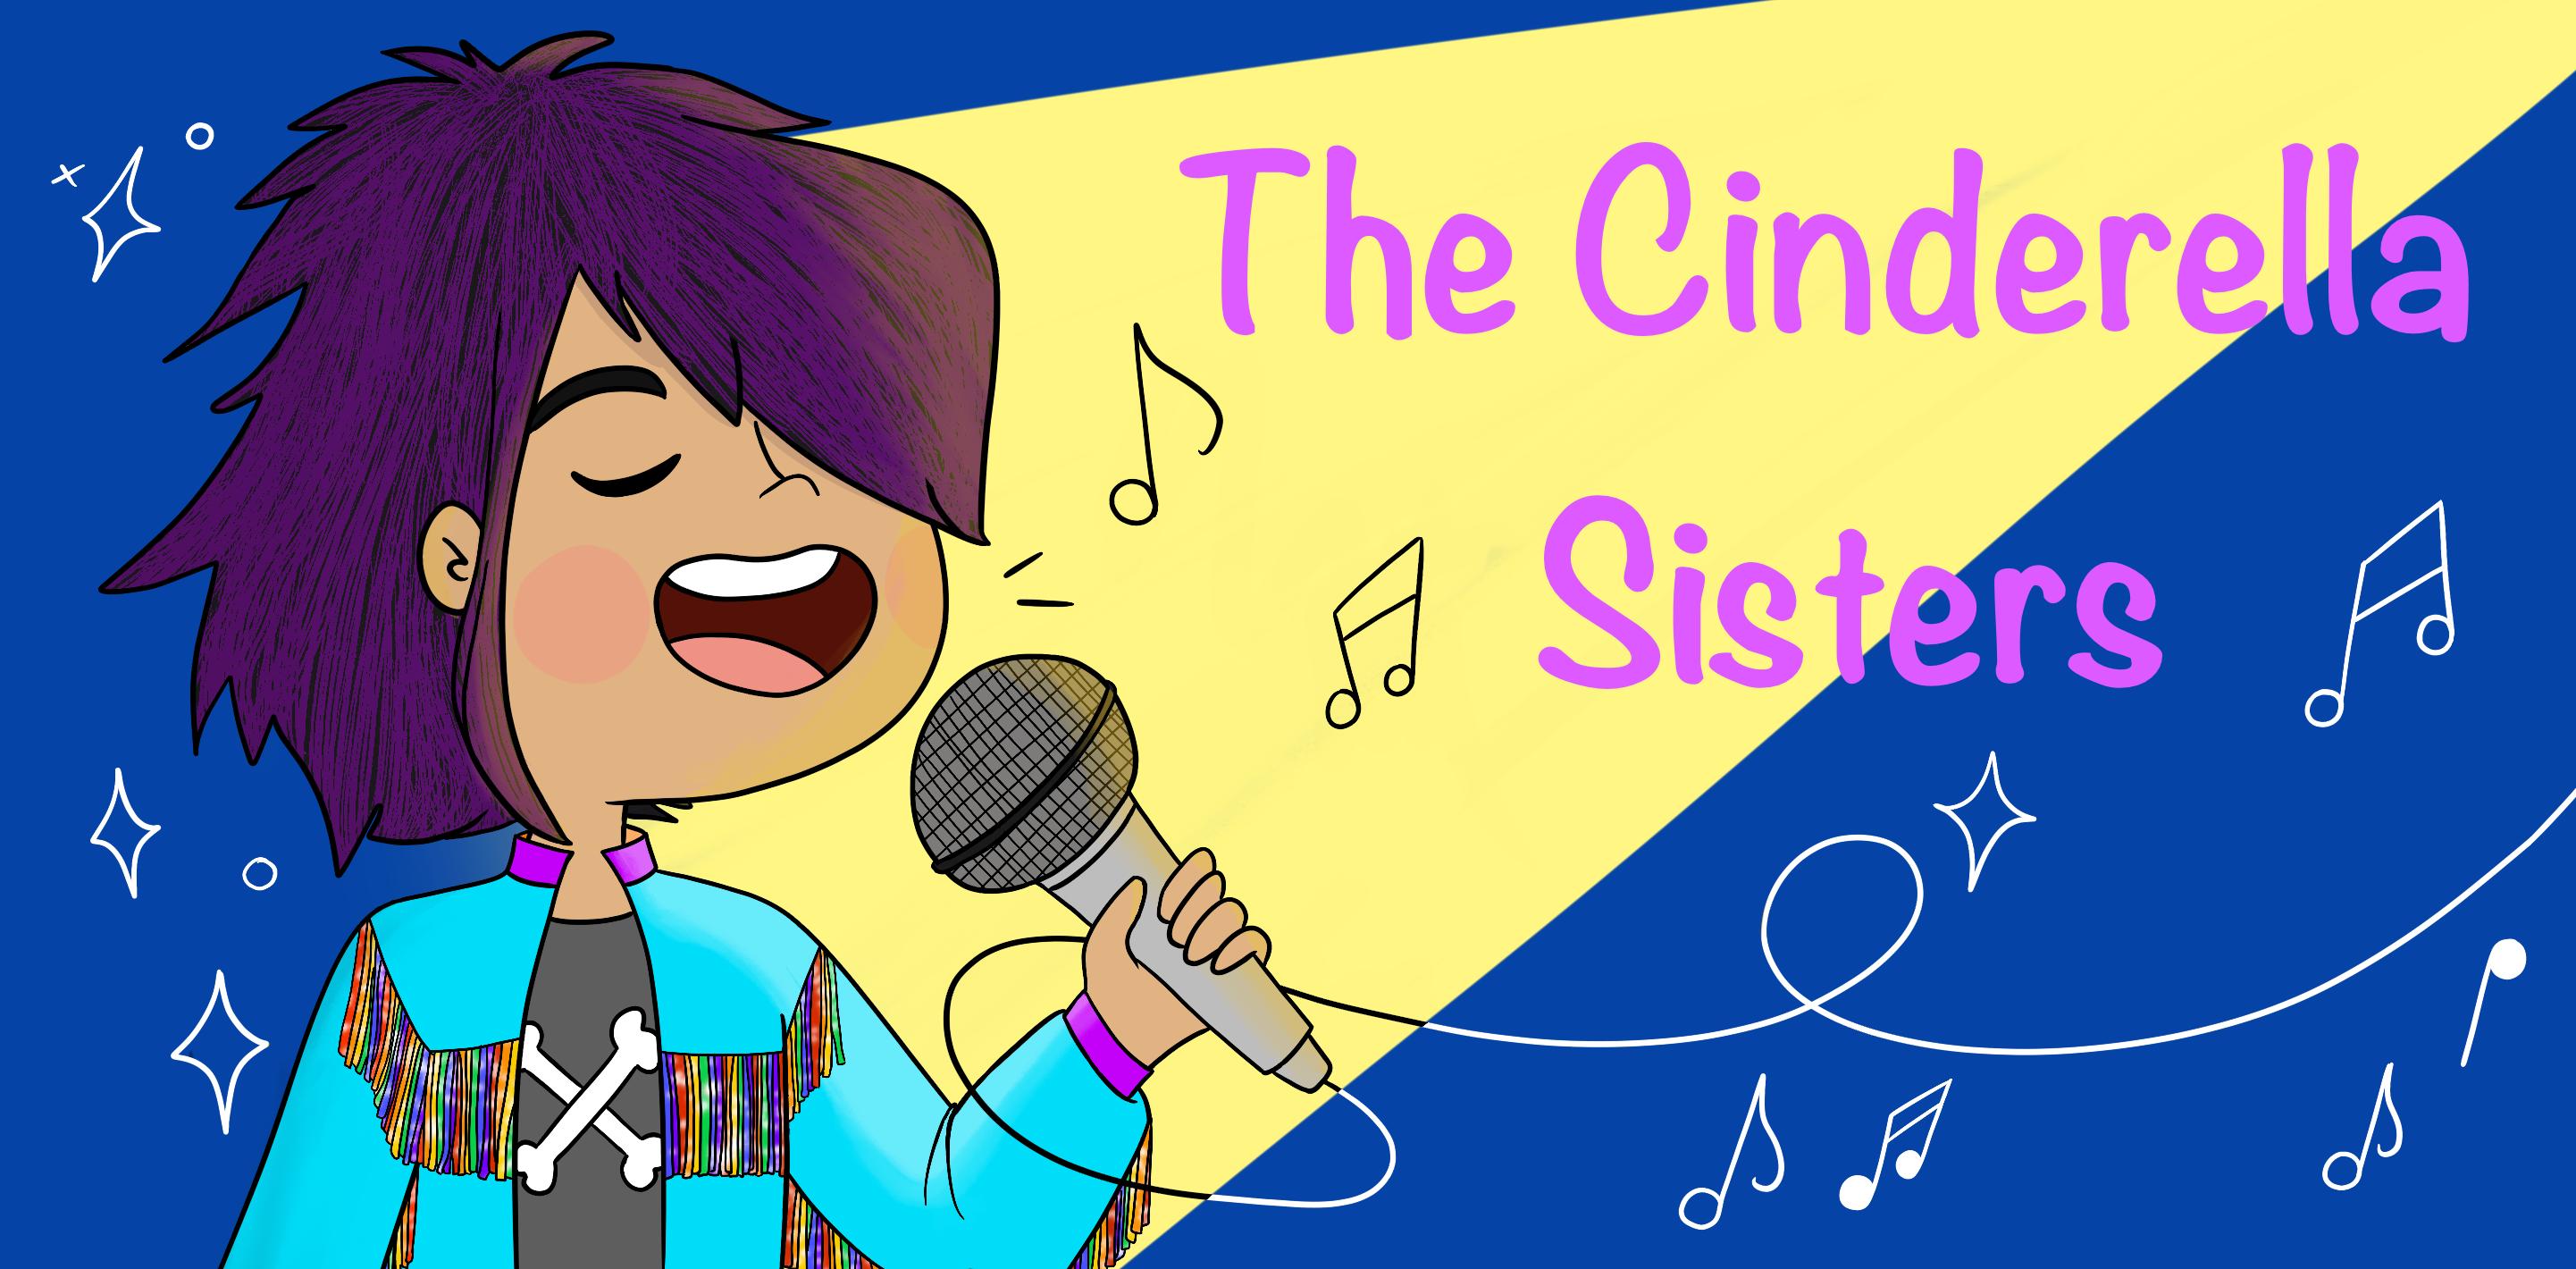 The Cinderella Sisters by Dana Boulé